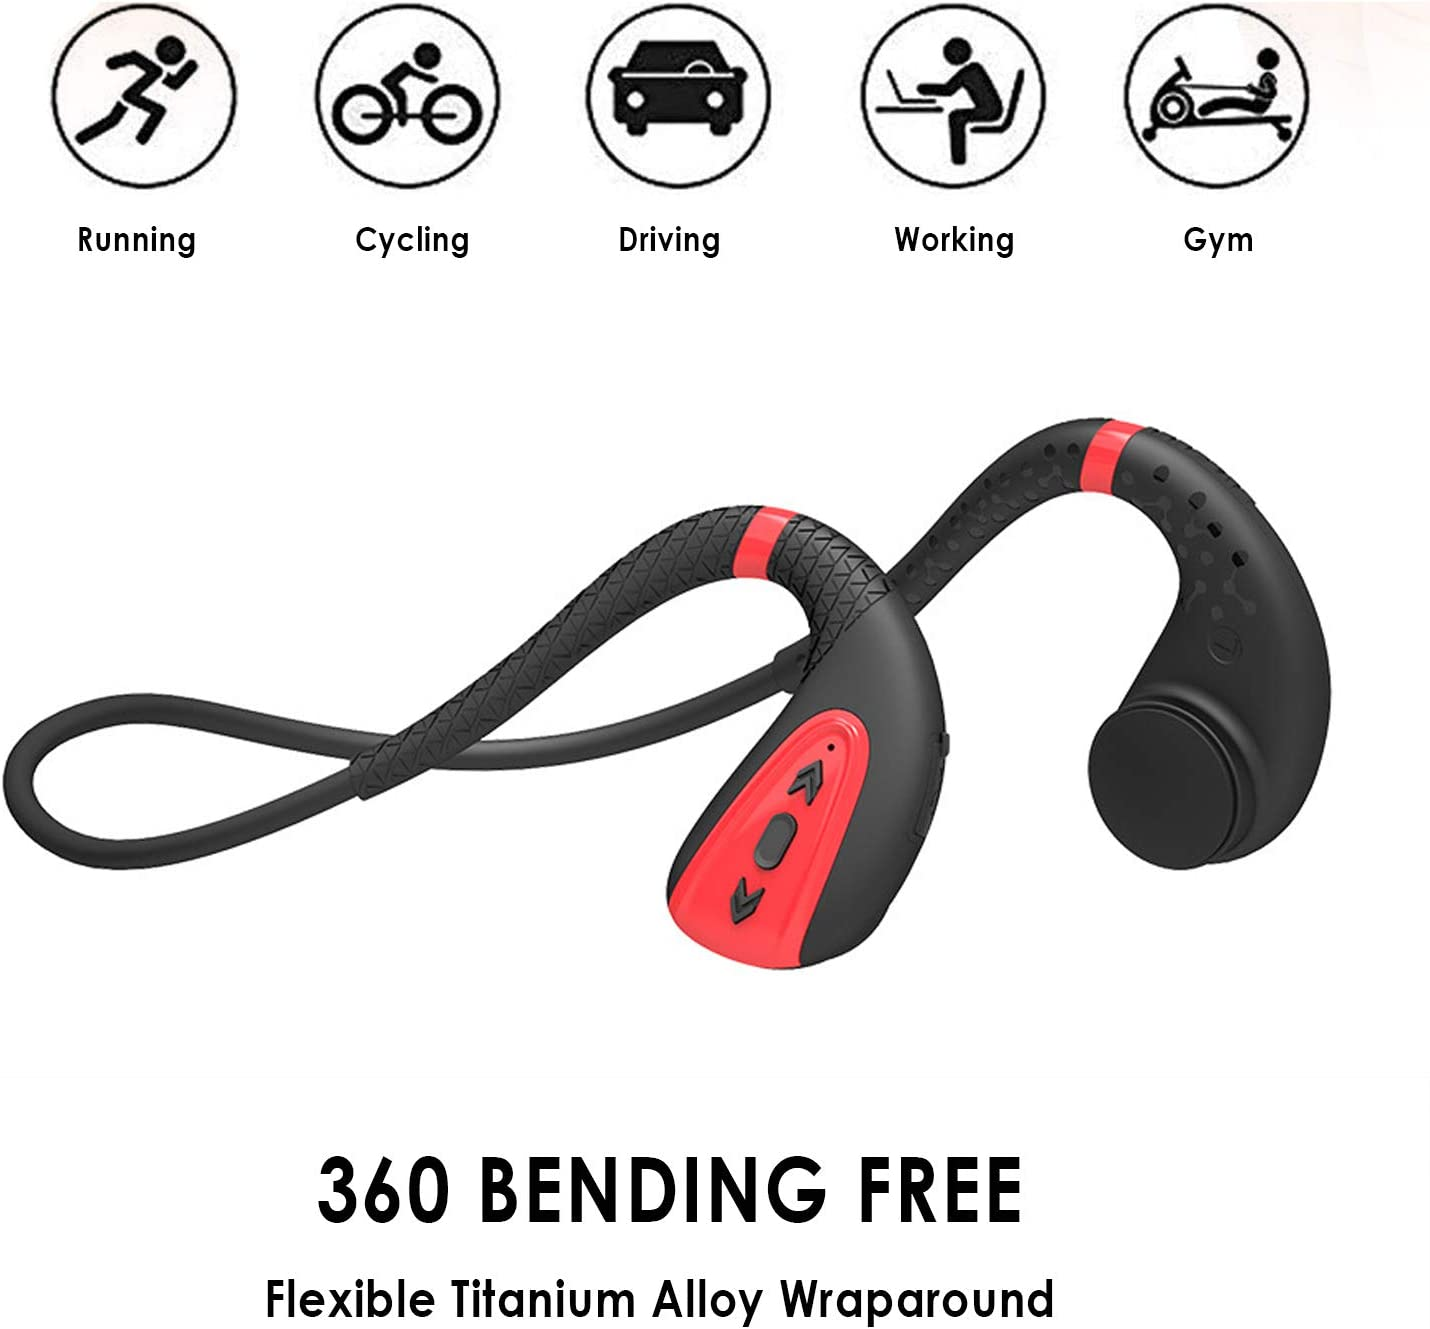 vapeonly Swimming MP3 Player Bluetooth 5.0 Bone Conduction Bluetooth Headset Headphone 8G MP3 Player Waterproof Wireless Sport Headset (Black Red)